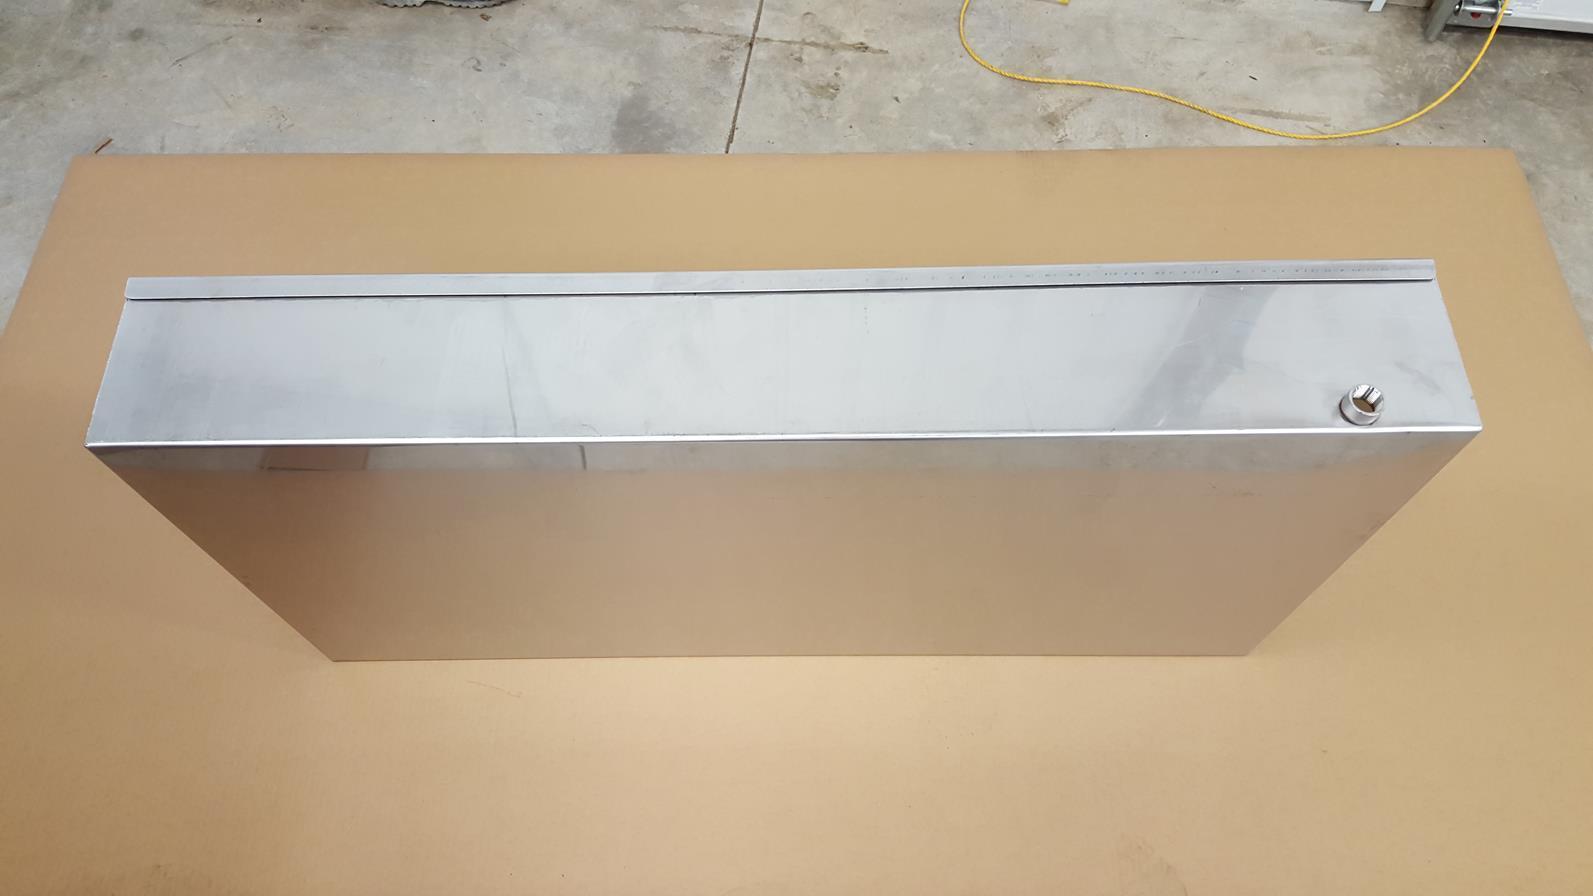 Maple Syrup Pan 24x36x7 18 ga ga ga Stainless evaporator coolship 2x3x7 214075